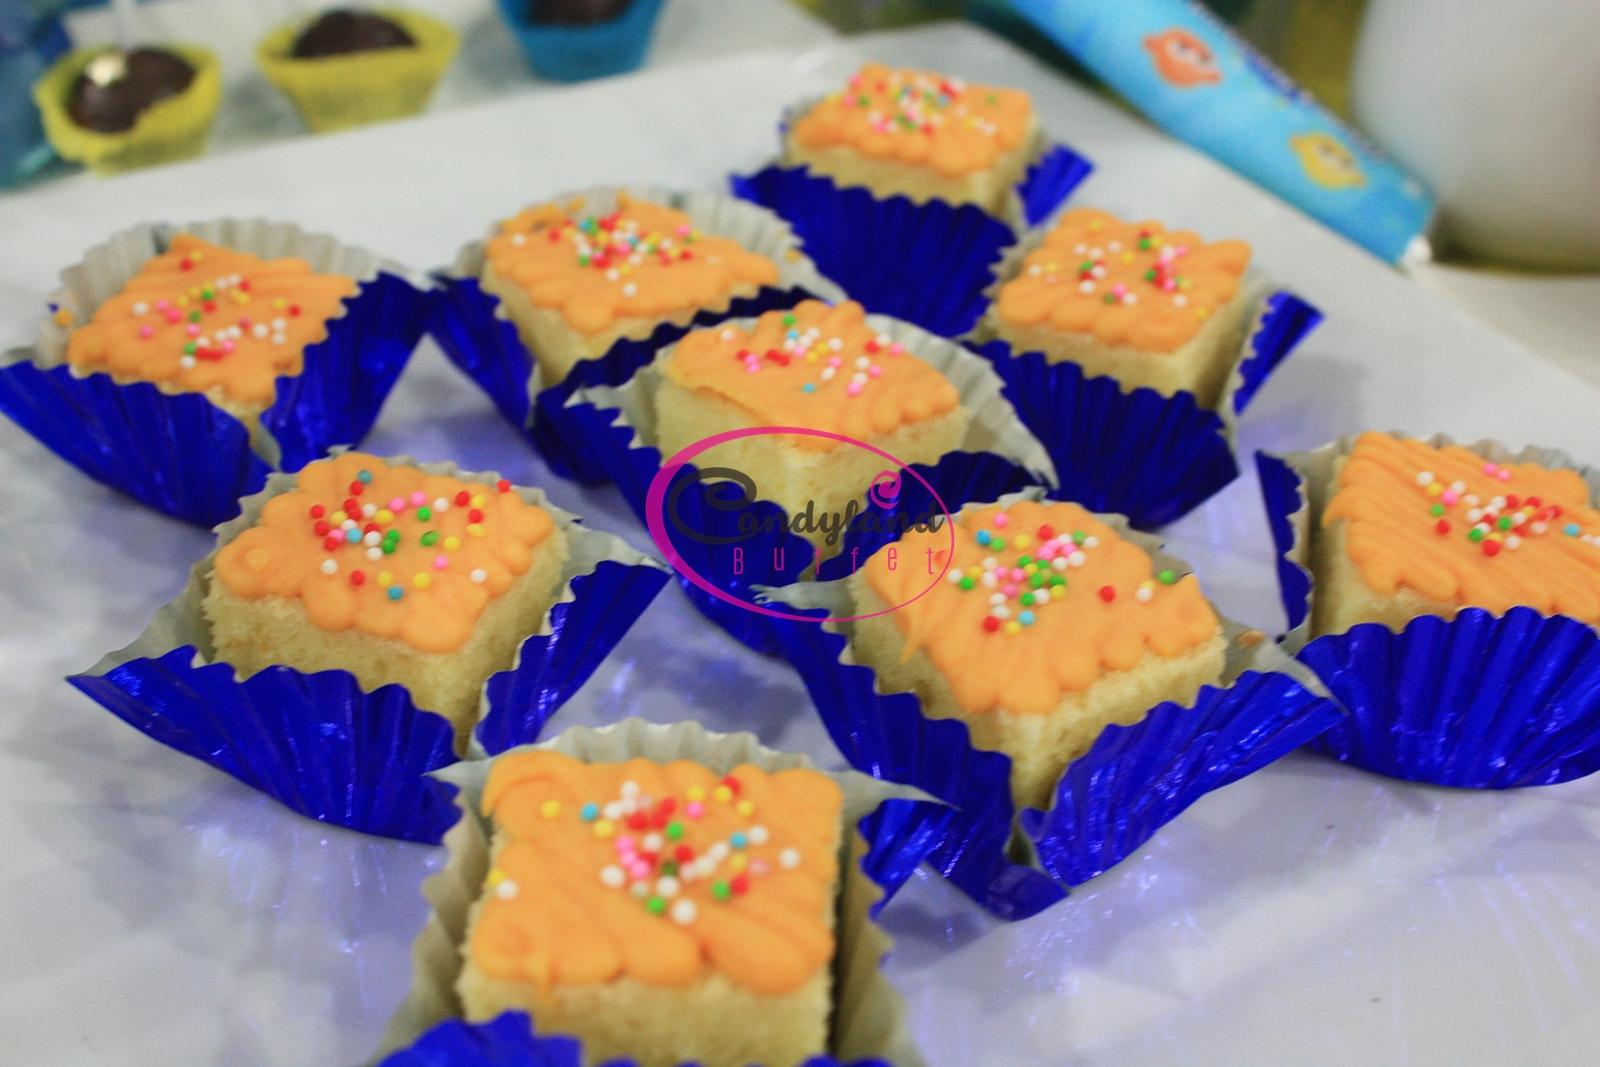 Candy Buffet Kota Kinabalu Sabah Baby Shark Birthday Theme